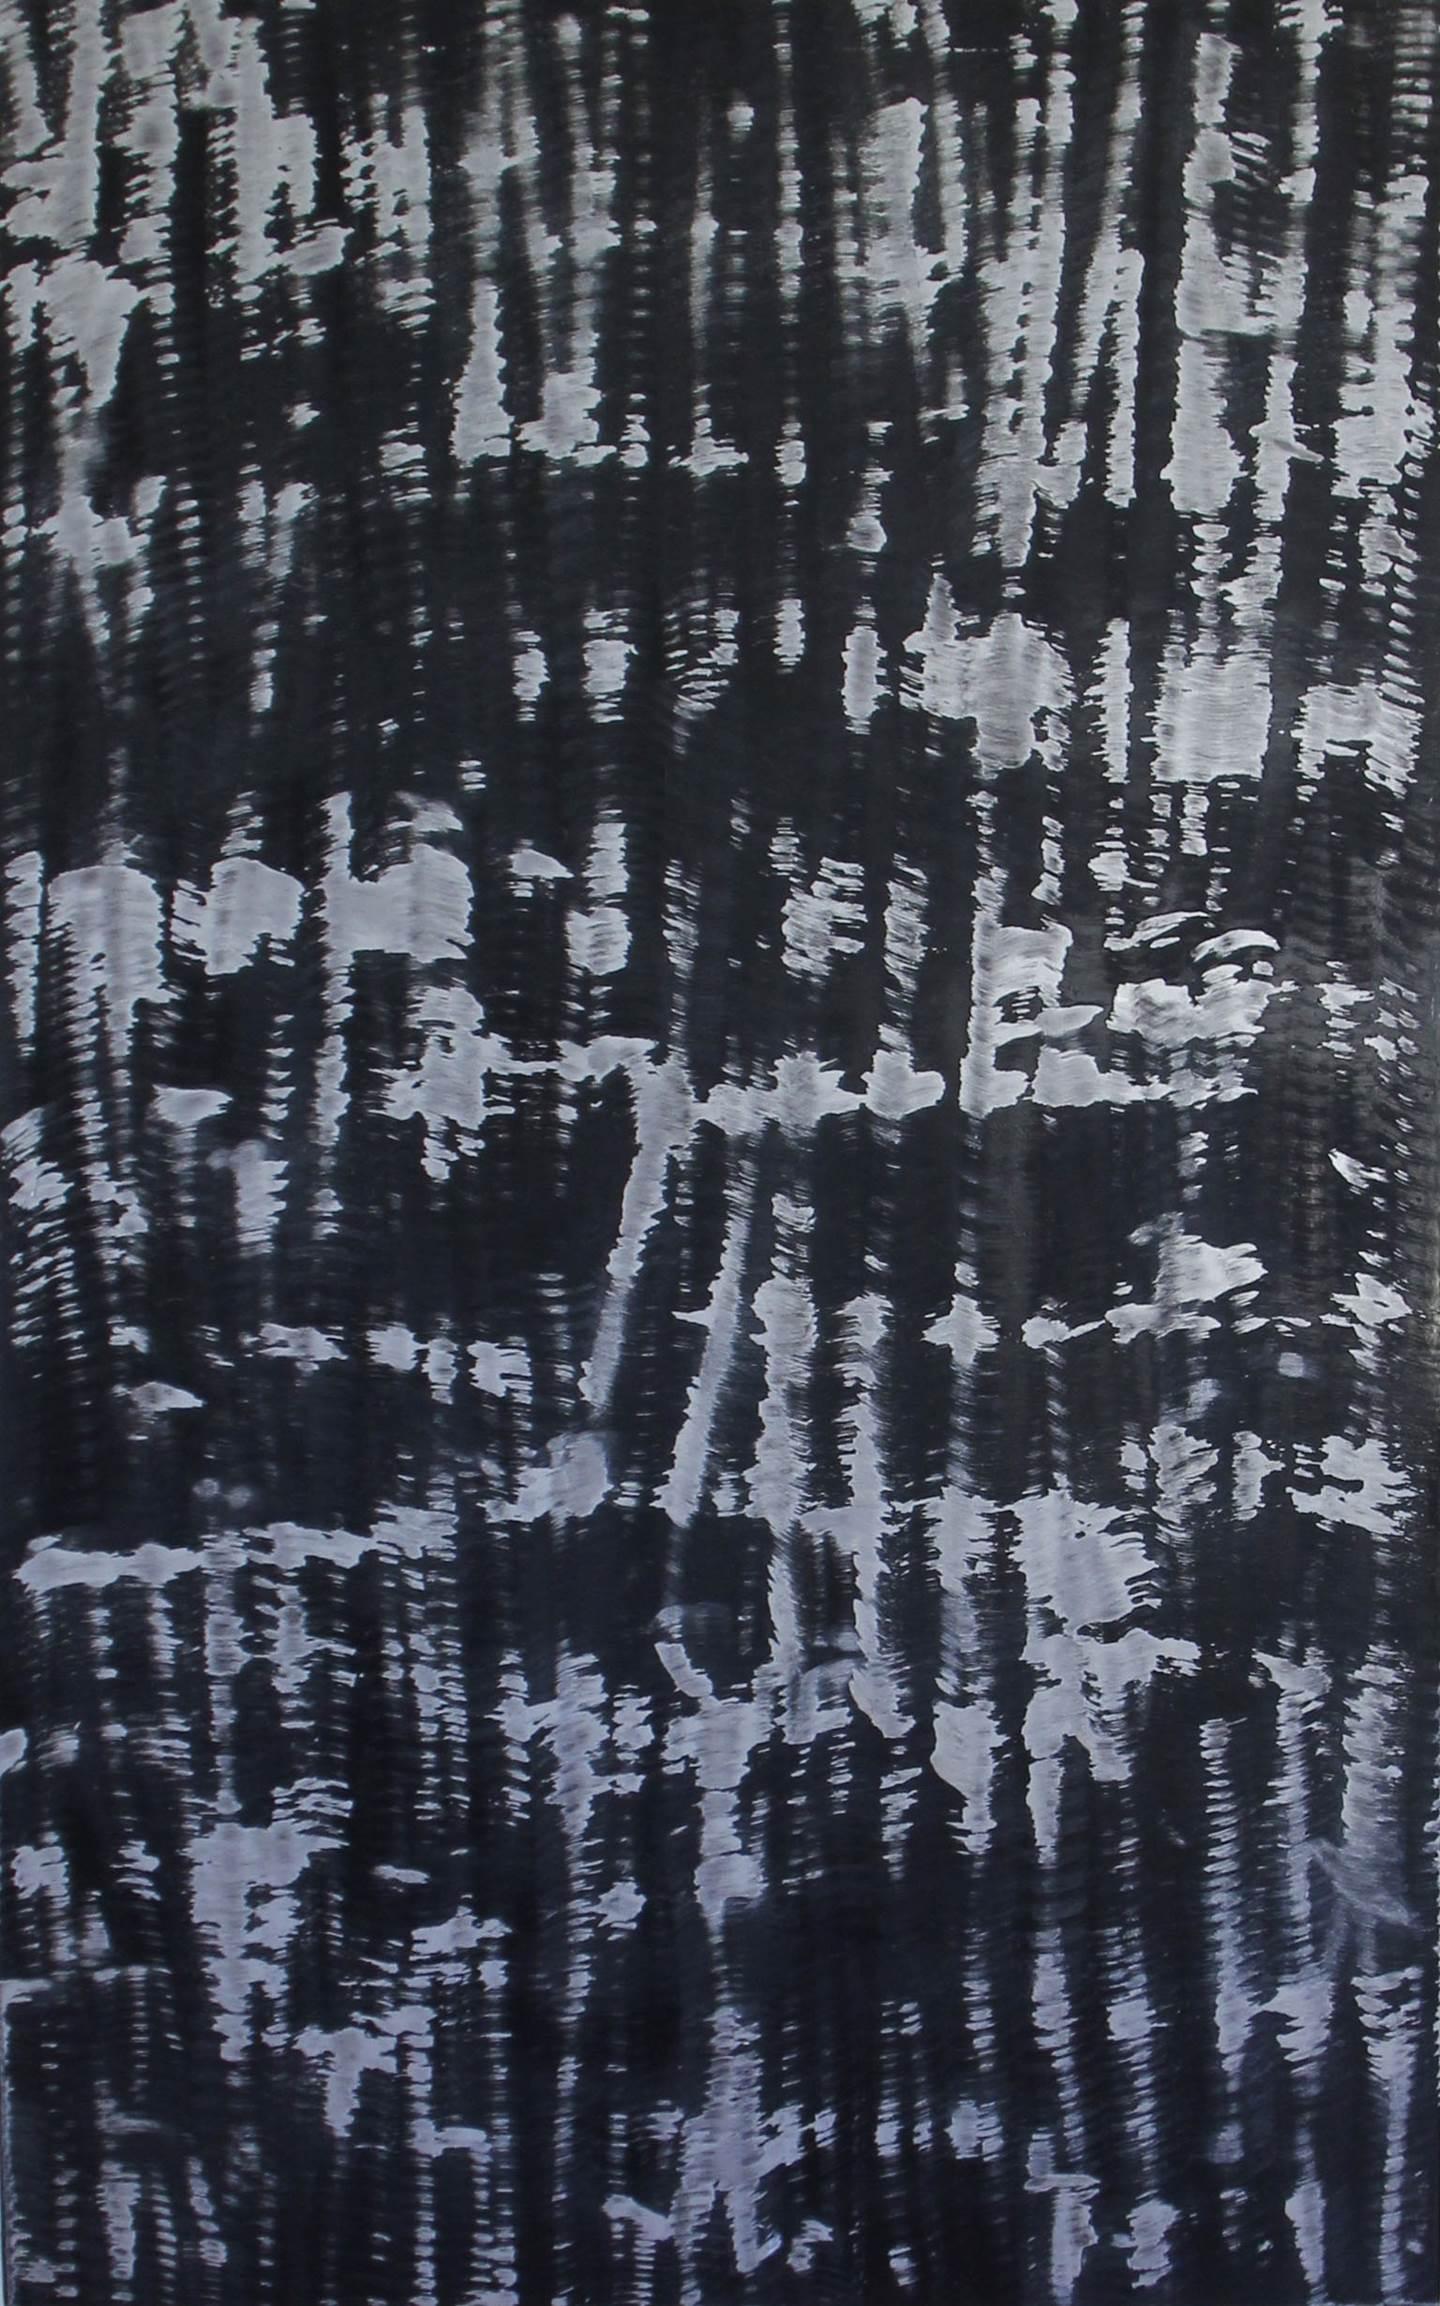 Pintura Preto E Branco Colecione Obras De Arte Zet Gallery